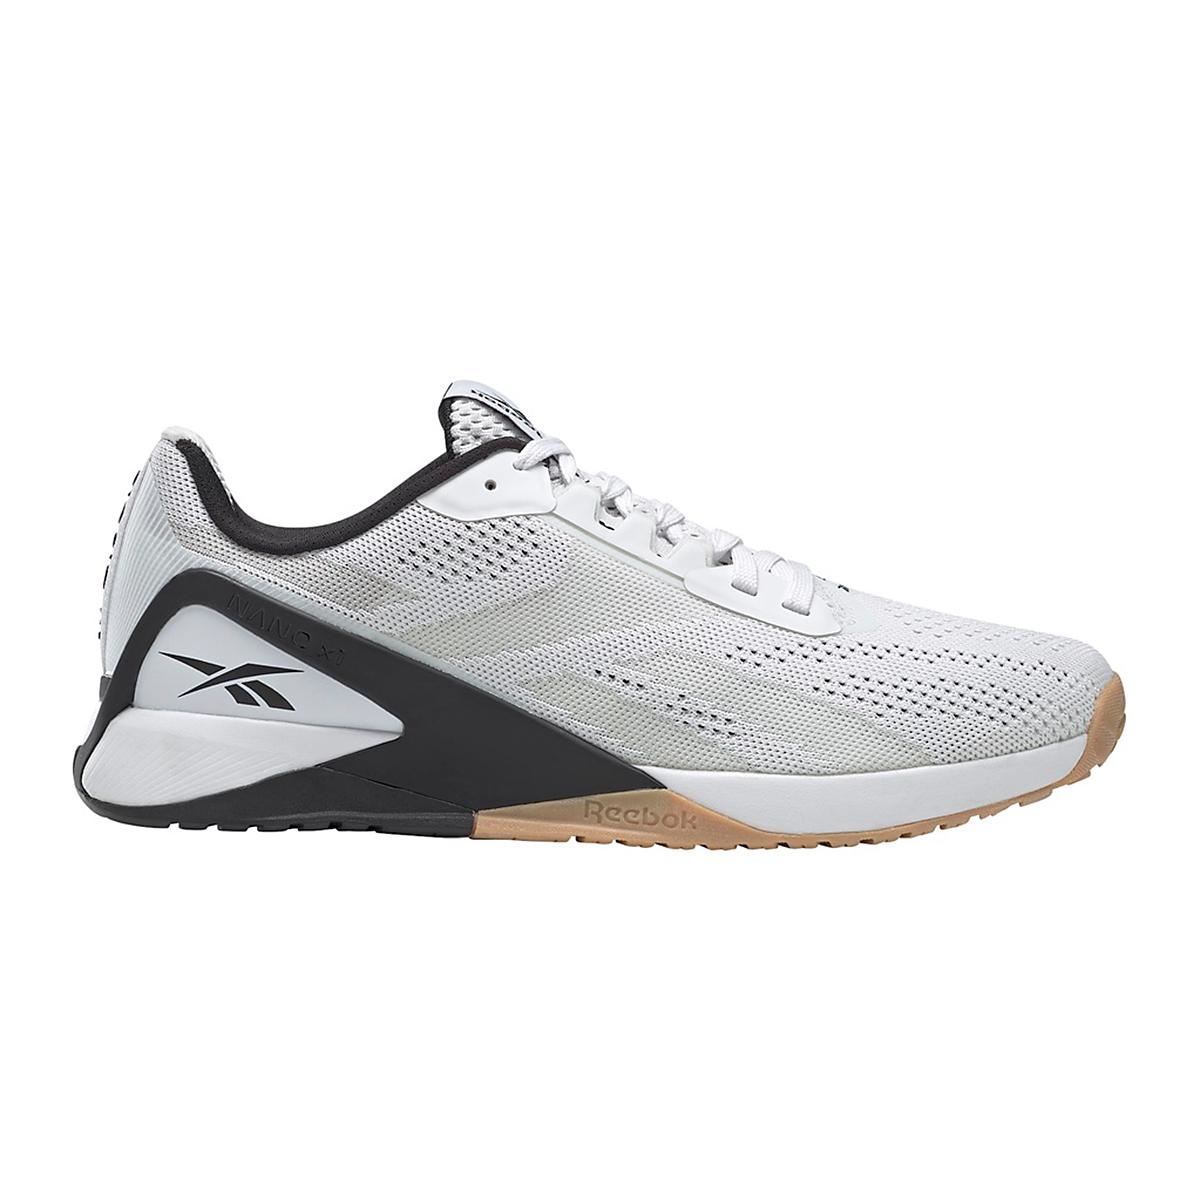 Men's Reebok Nano X1 Training Shoe - Color: White/Black/Reebok Rubber Gum - Size: 6 - Width: Regular, White/Black/Reebok Rubber Gum, large, image 1